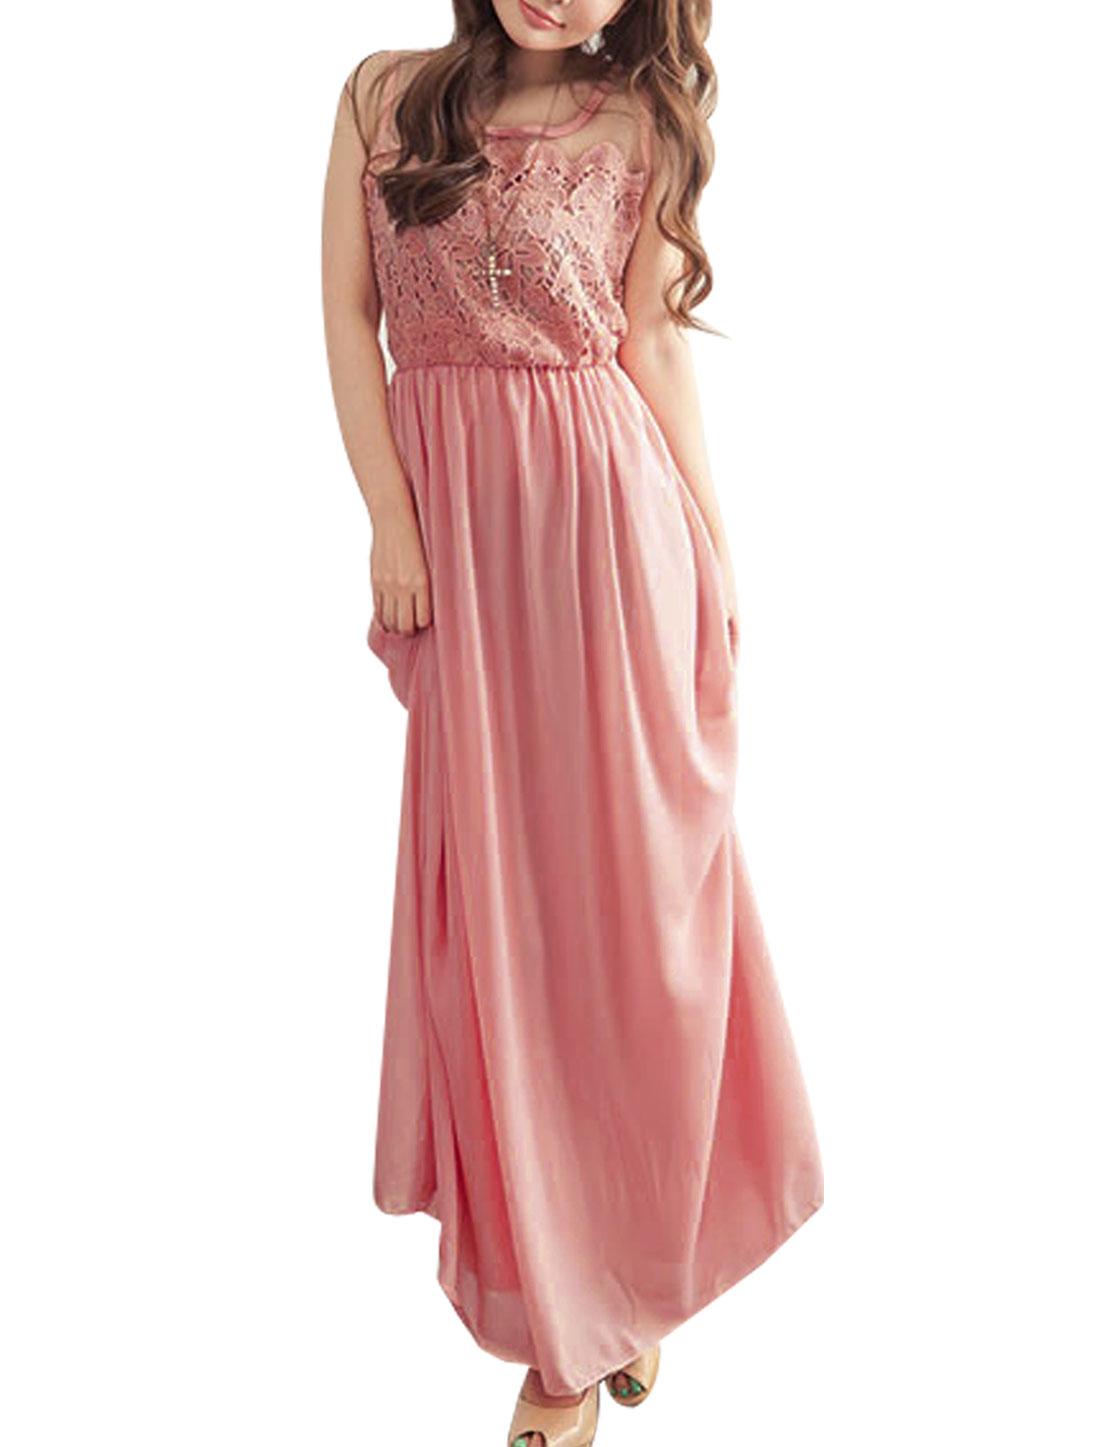 Womens Sleeveless Elastic High Waist Chiffon Full Length Dress Pink XS